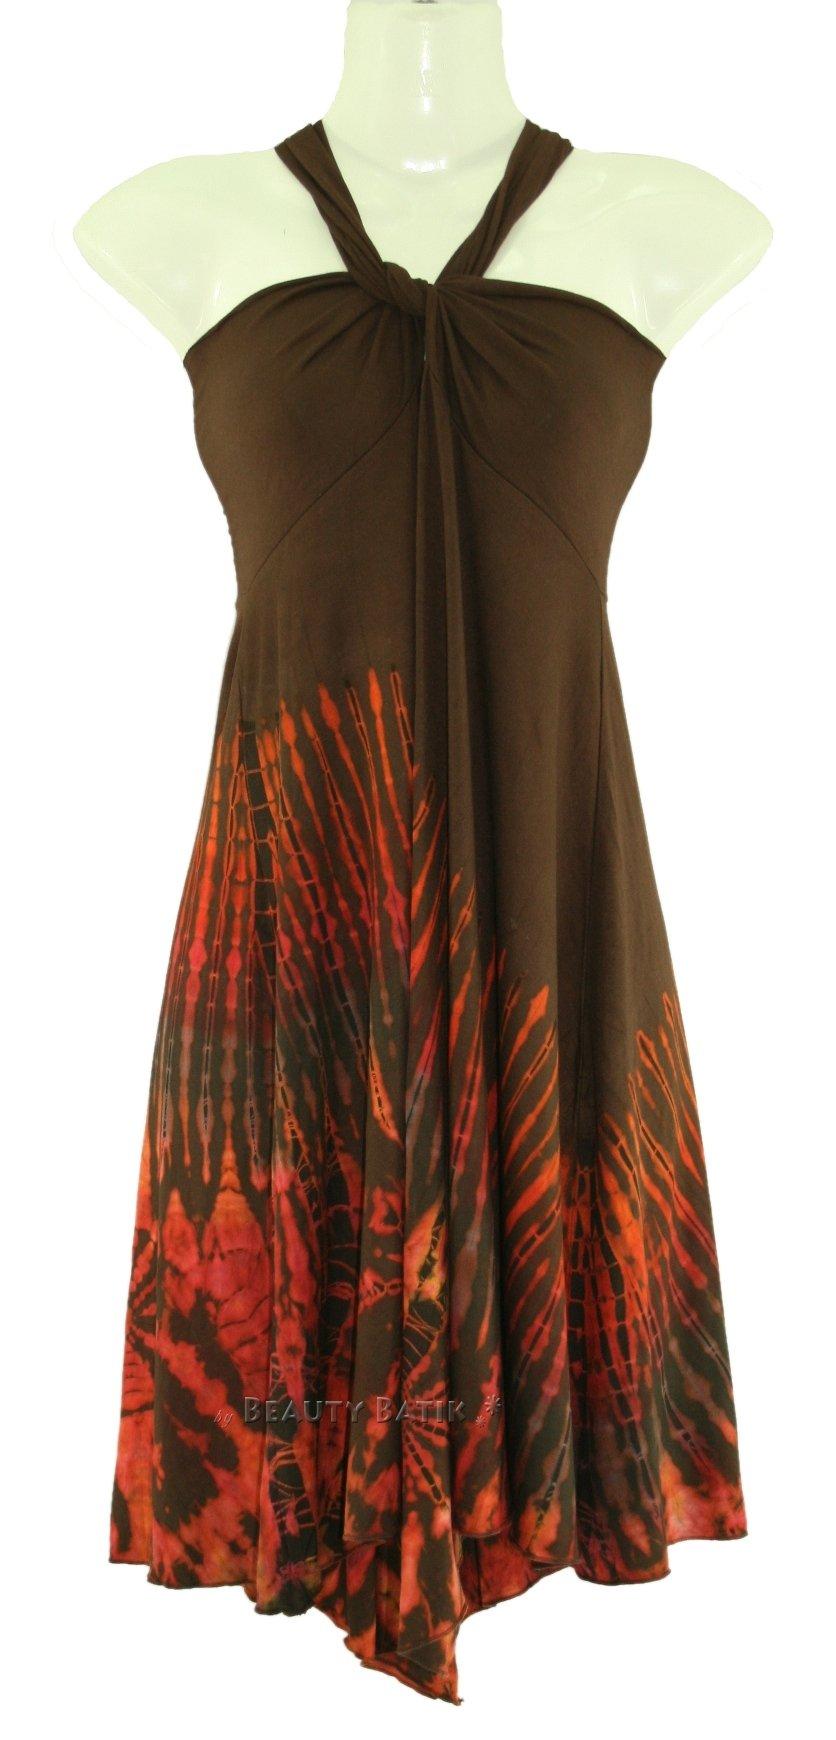 brown tie dye hippie sexy summer sun dress skirt sz s m 8 10 12 ebay. Black Bedroom Furniture Sets. Home Design Ideas